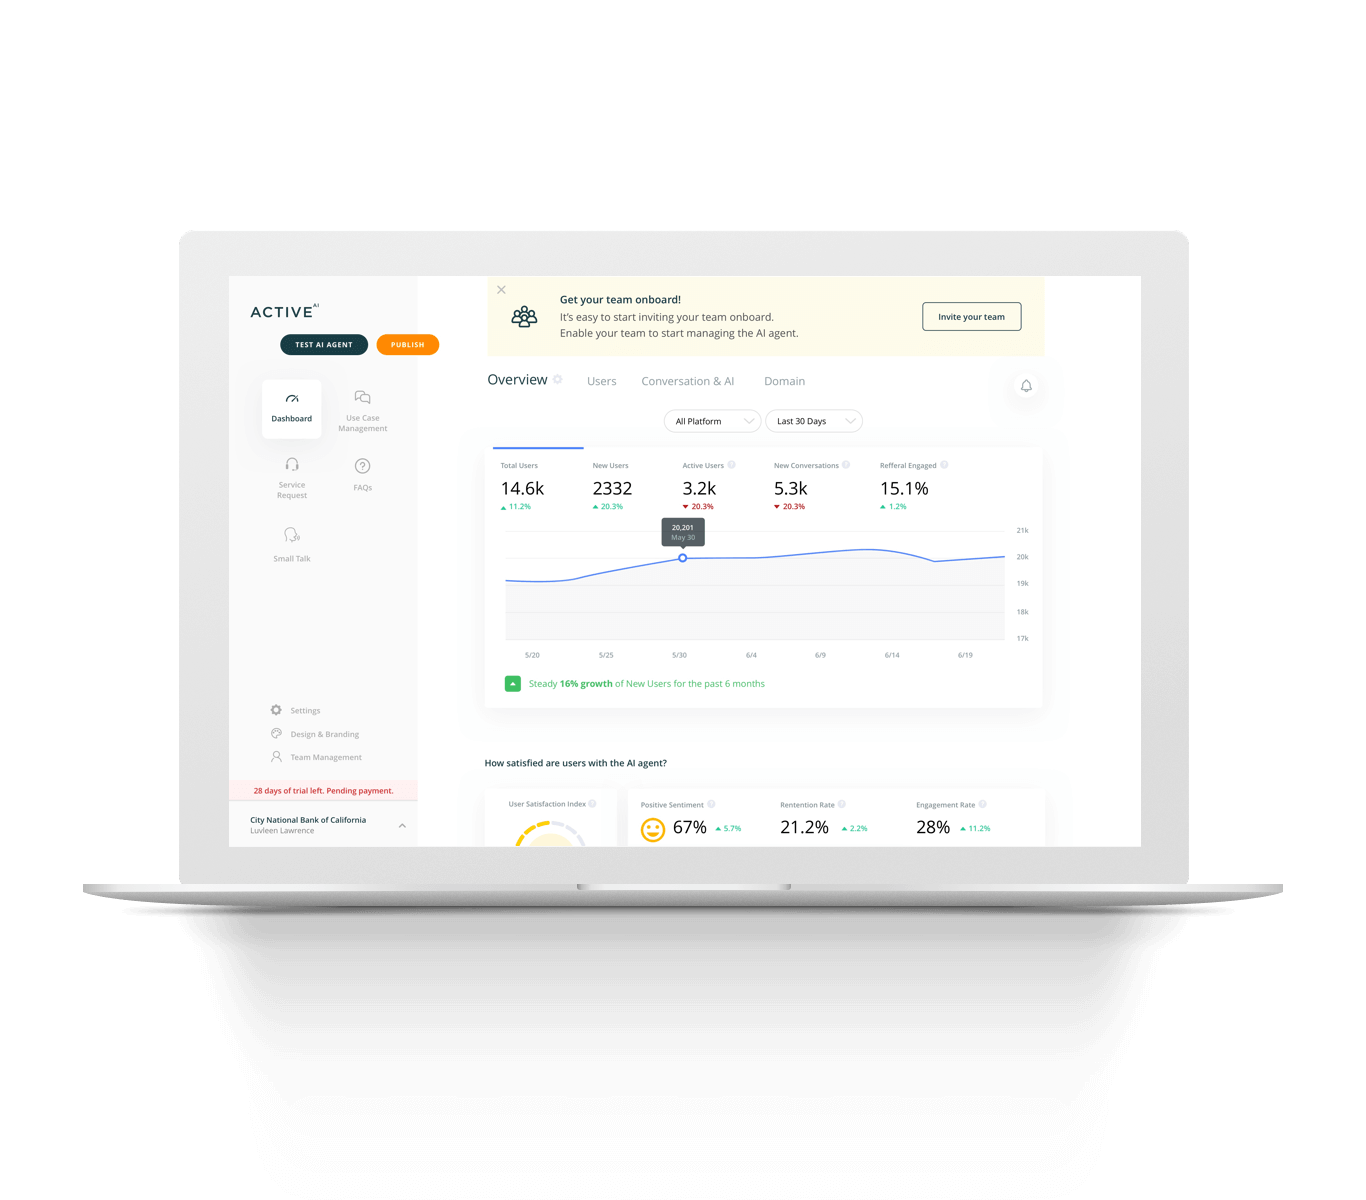 Macbook-mockup-dashboard-2